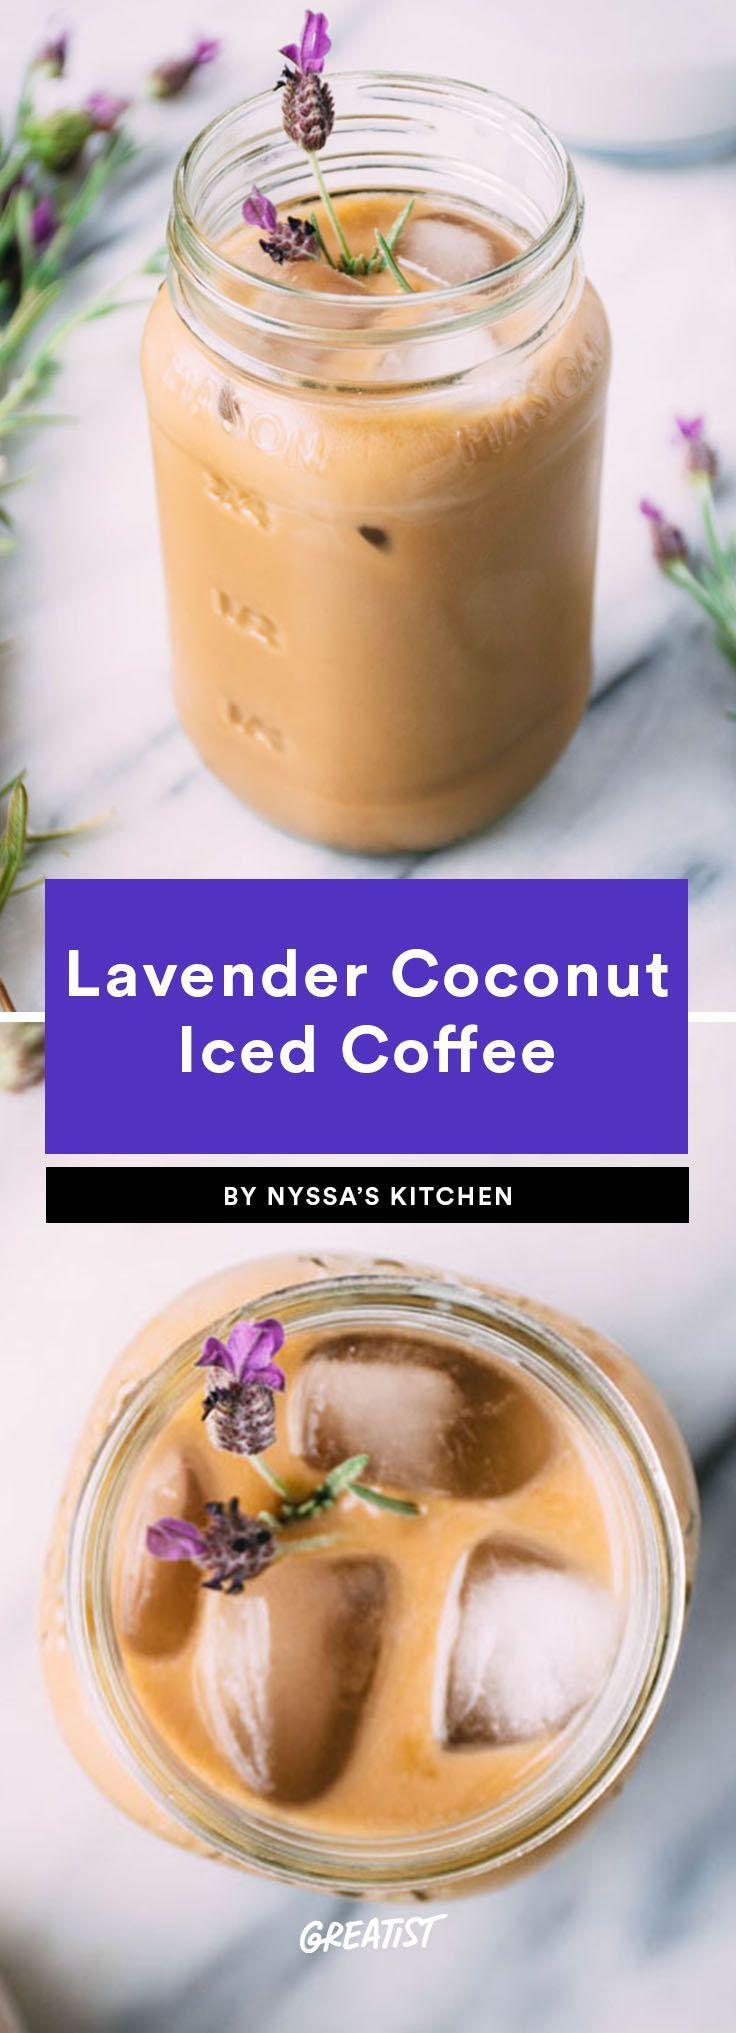 11 Ways to Make Iced Coffee Taste Even Better